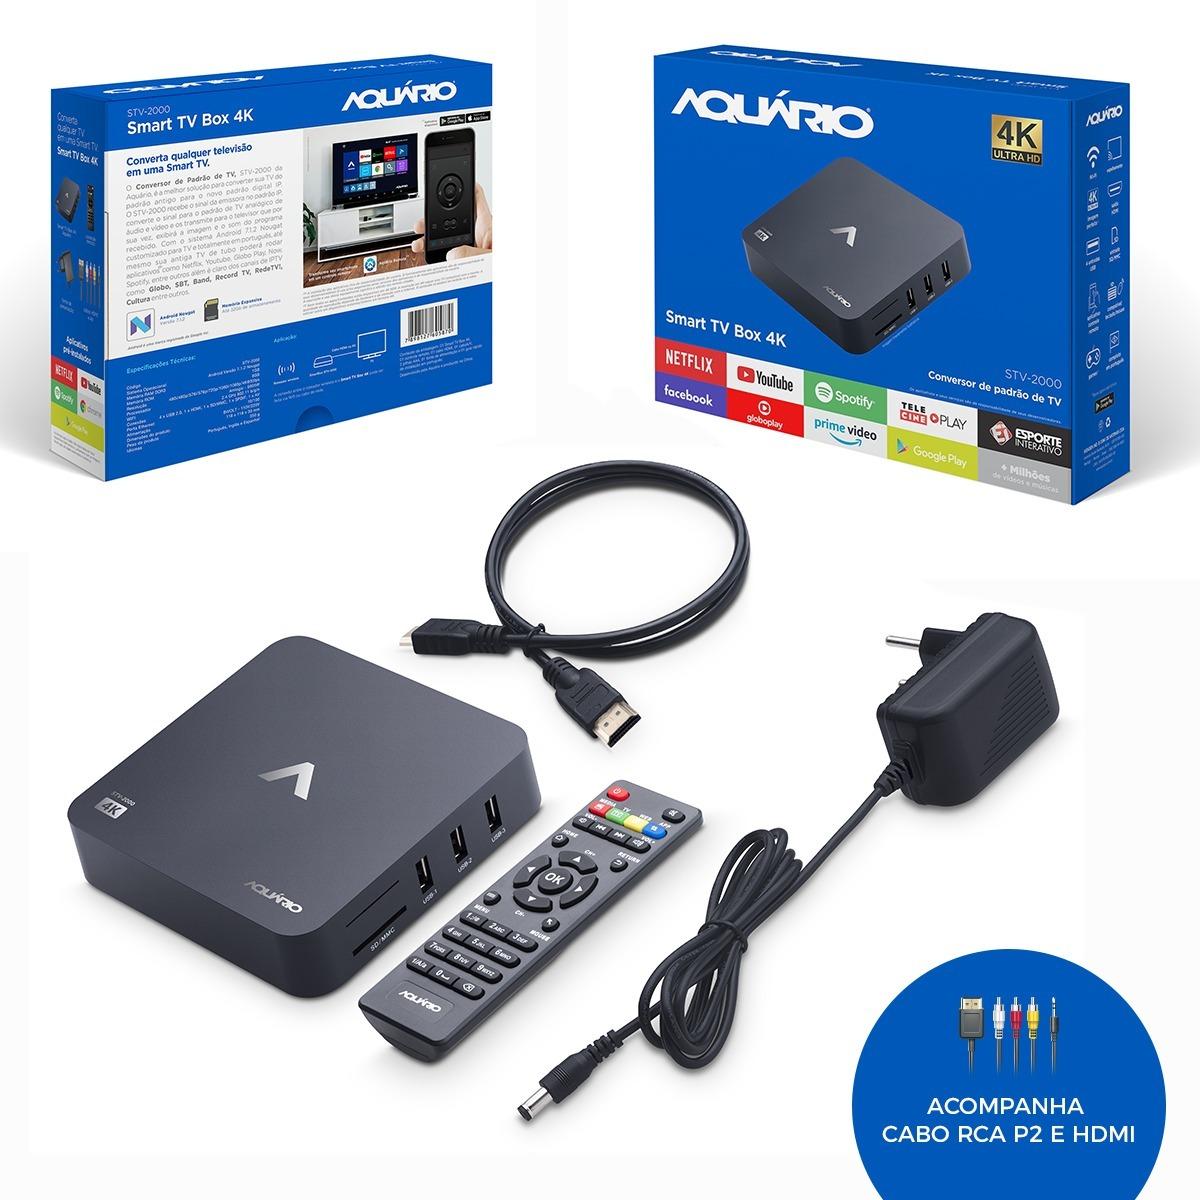 Smart Tv Box Com Netflix, Youtube, Globo Play, Telecine Play